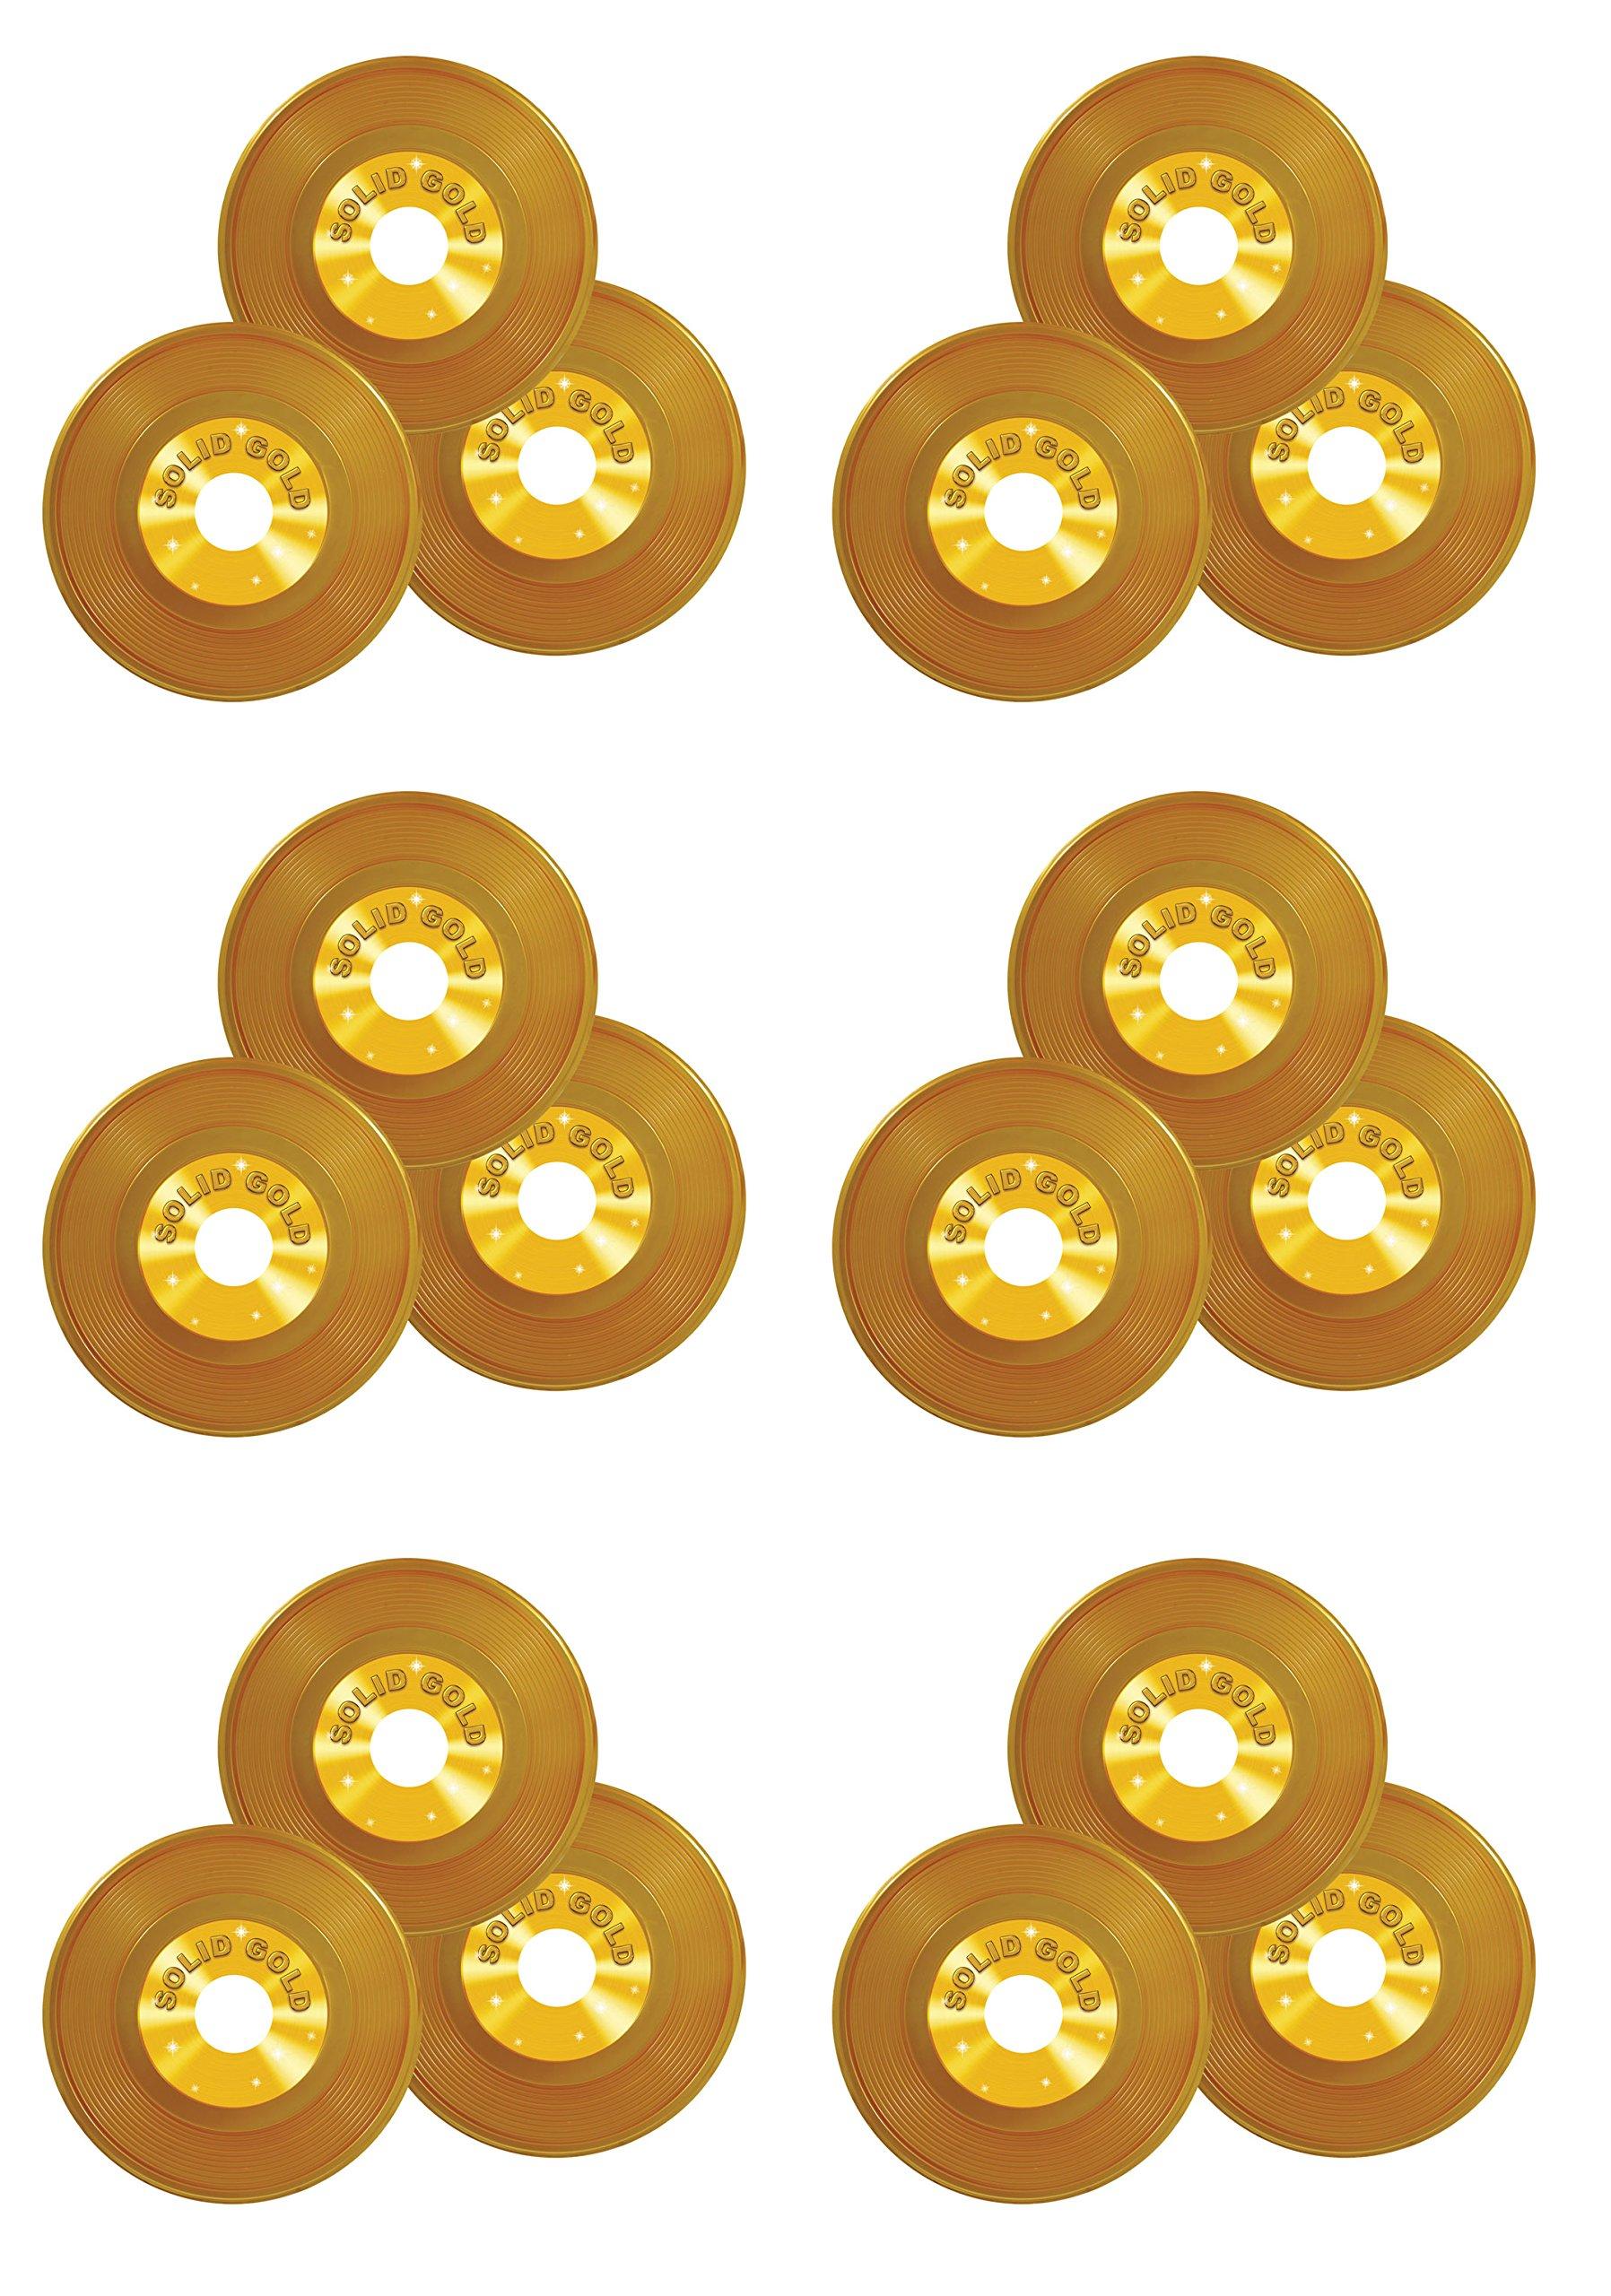 Beistle S57208Az6 Plastic Records 18 Piece, 9'', Gold by Beistle